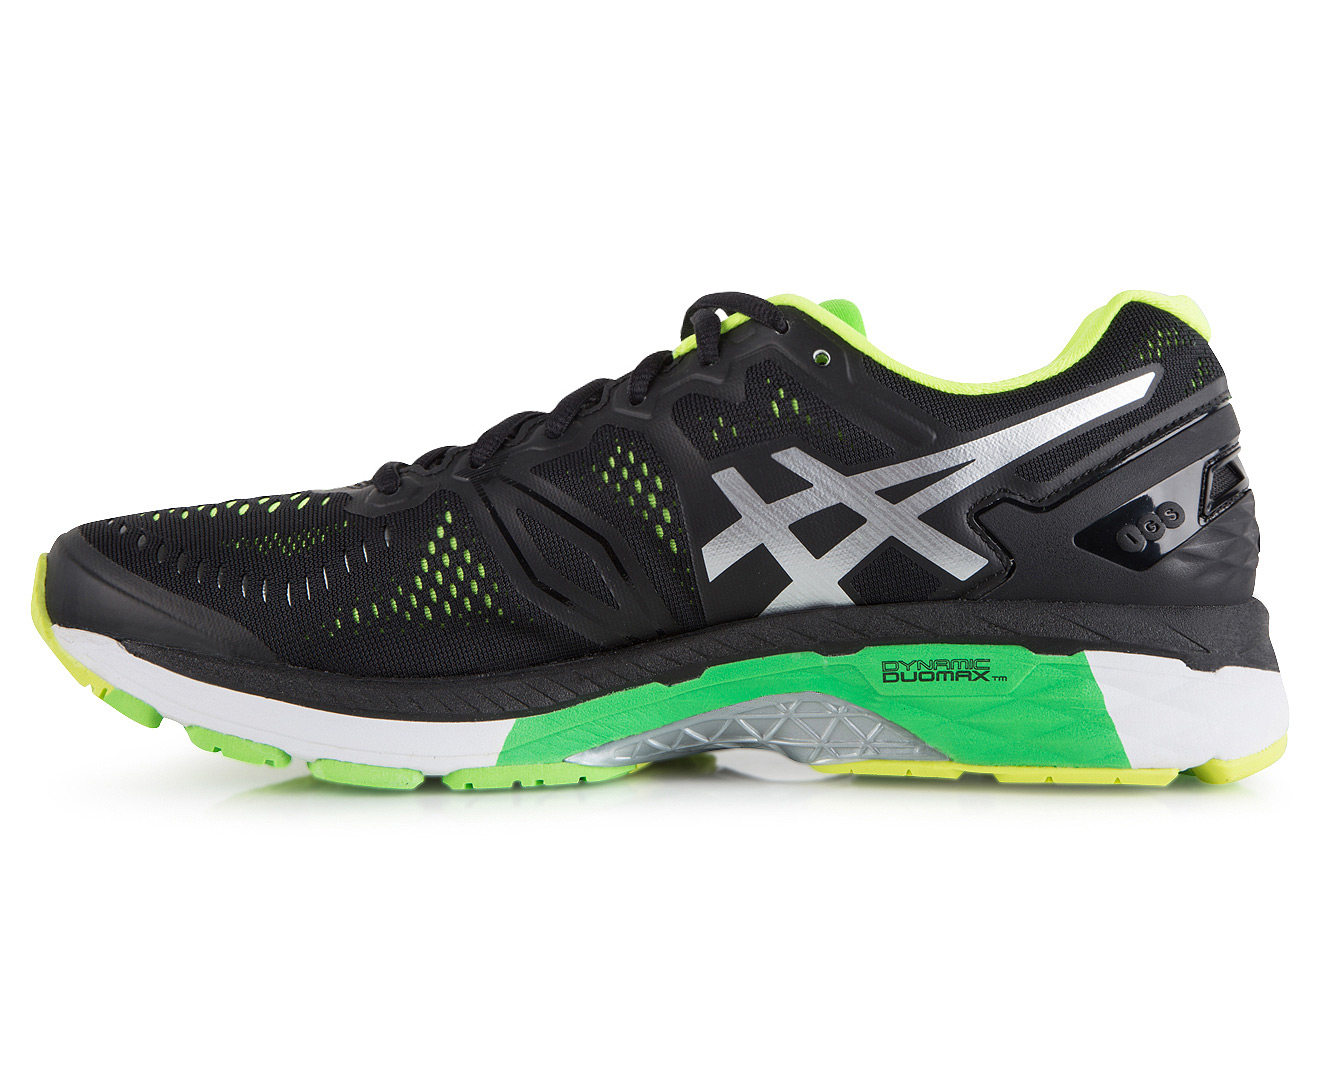 buy online a0ec5 33a93 ASICS Men's GEL-Kayano 23 Shoe - Black/Silver/Safety Yellow